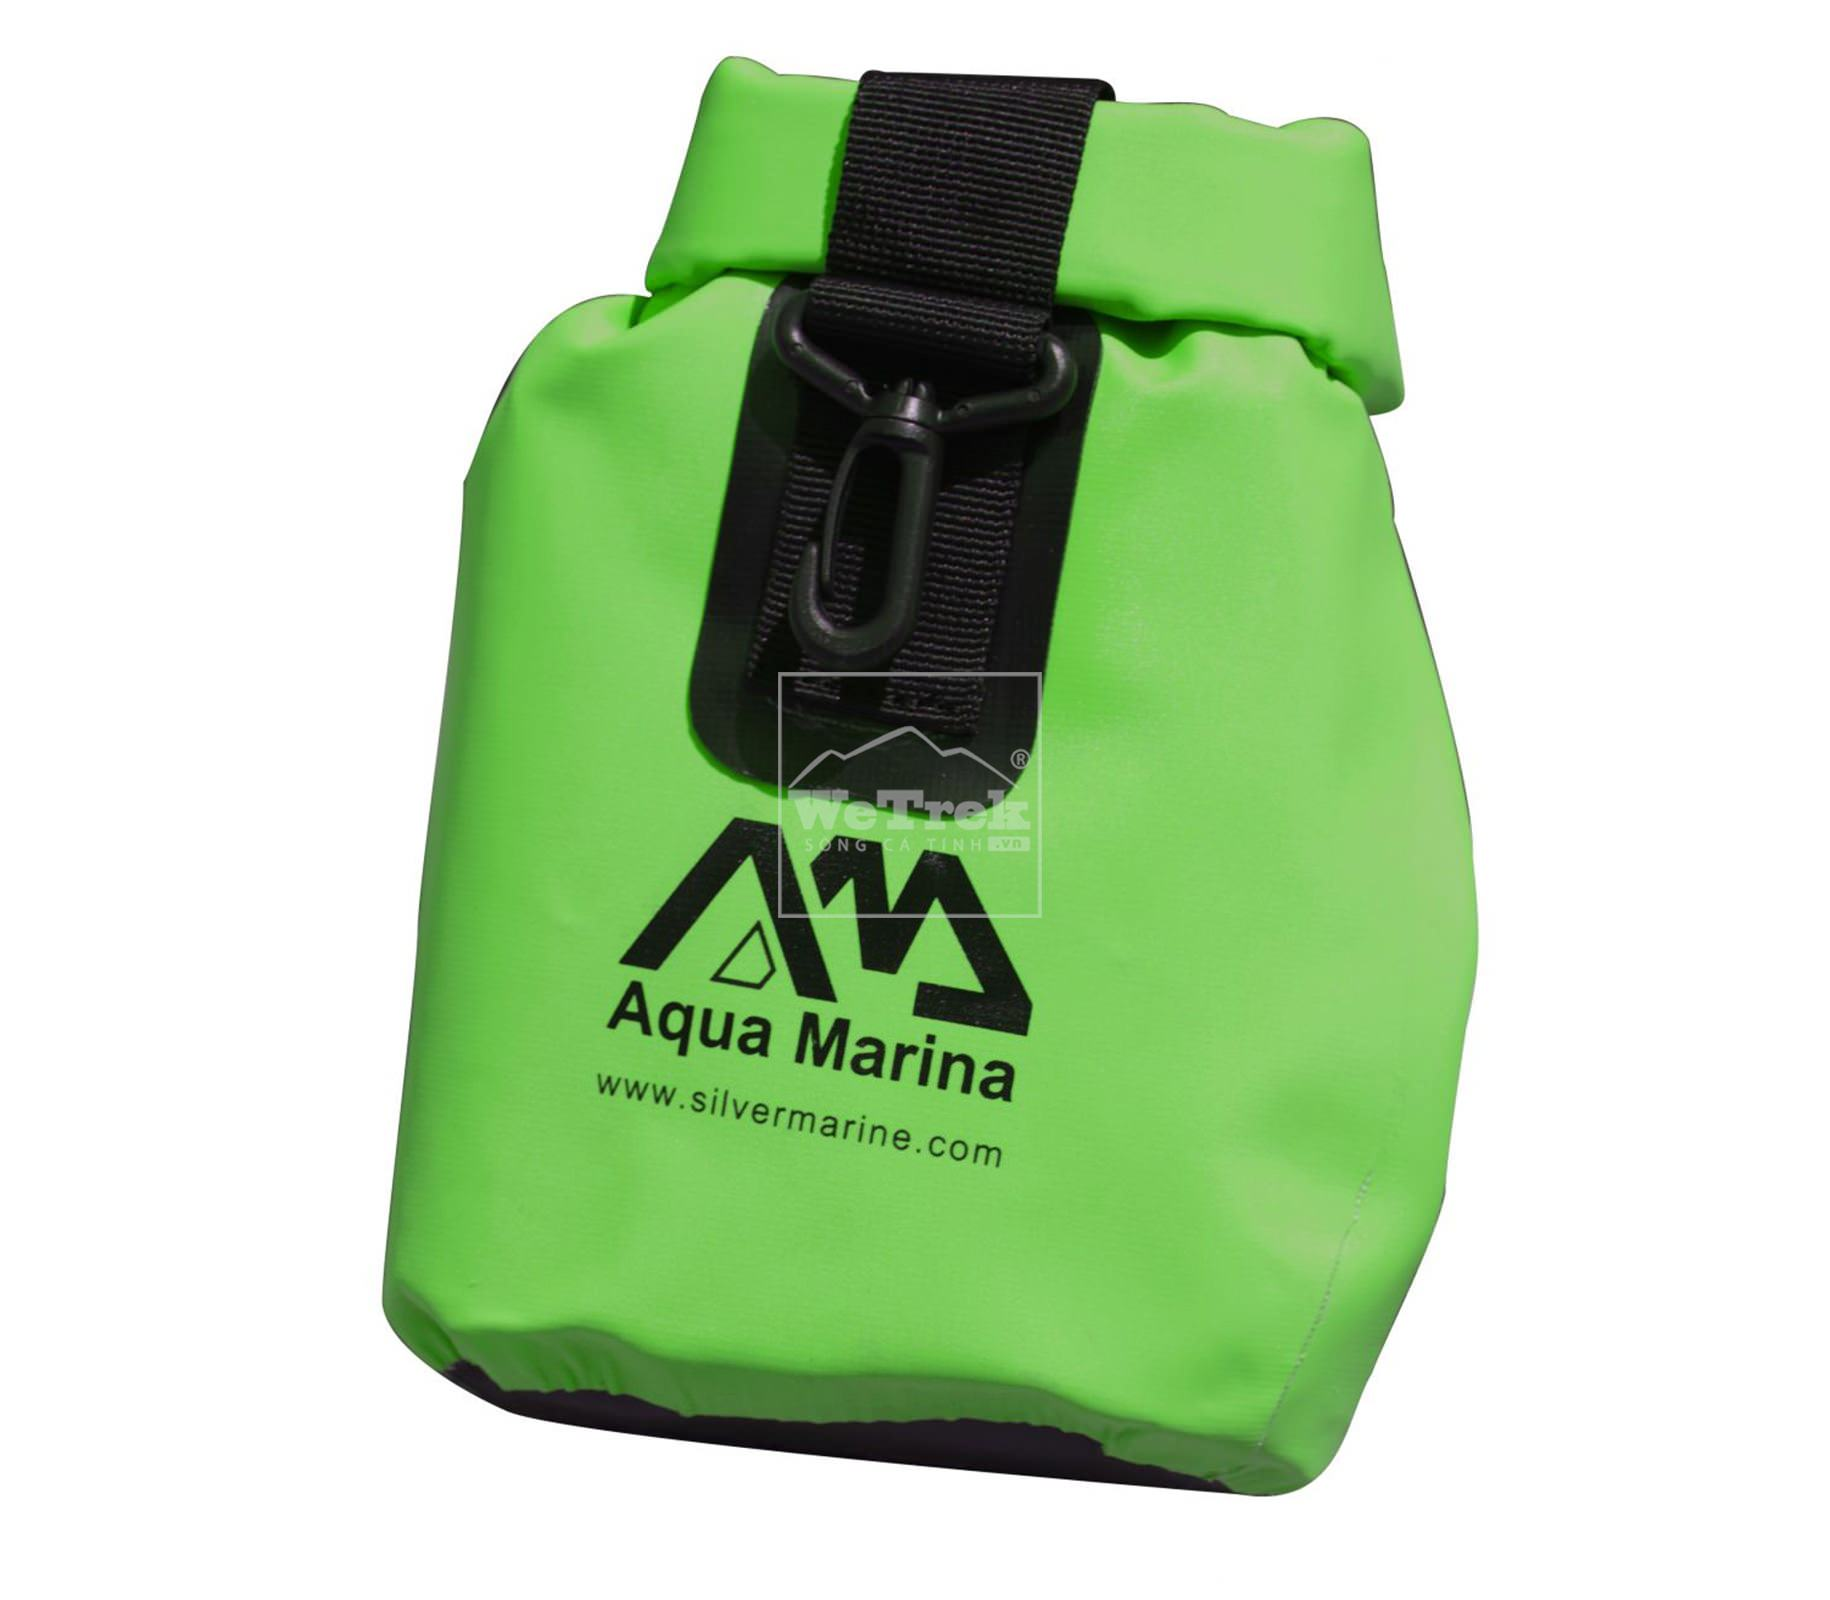 tui-kho-mini-aqua-marina-dry-bag-wetrek.vn-2